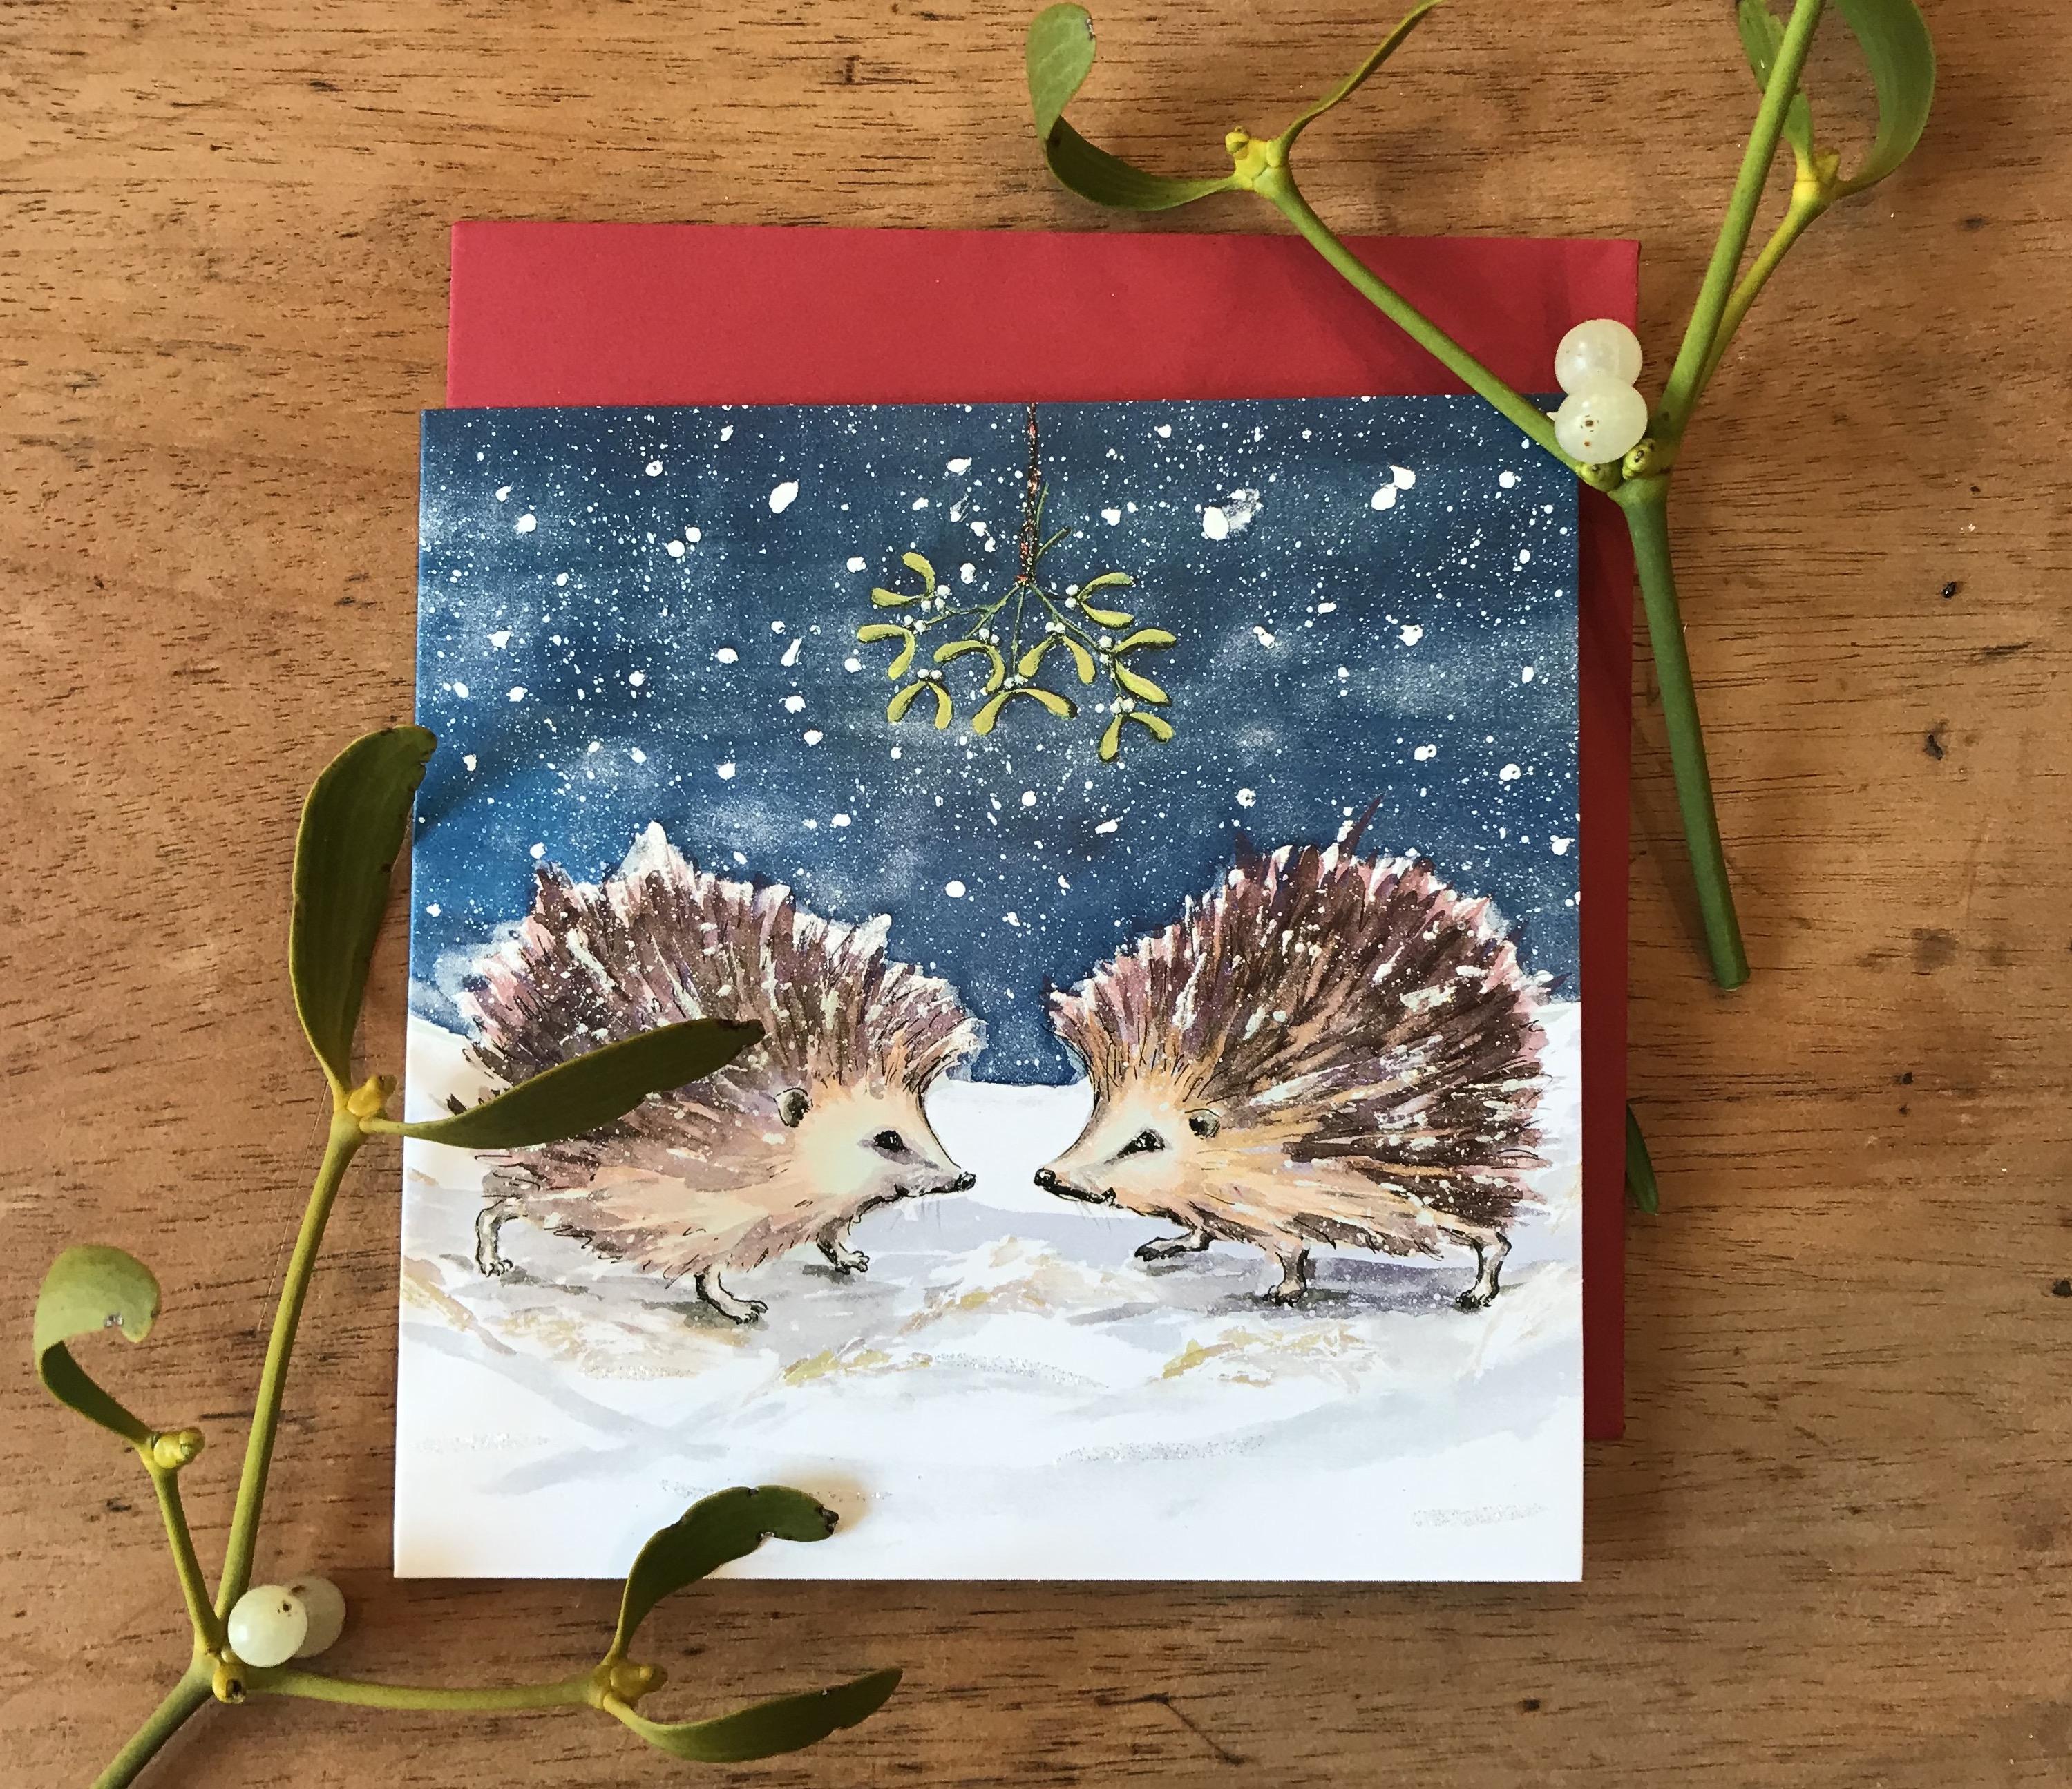 'Christmas Kiss' Charity Christmas Card Pack - was £4.50